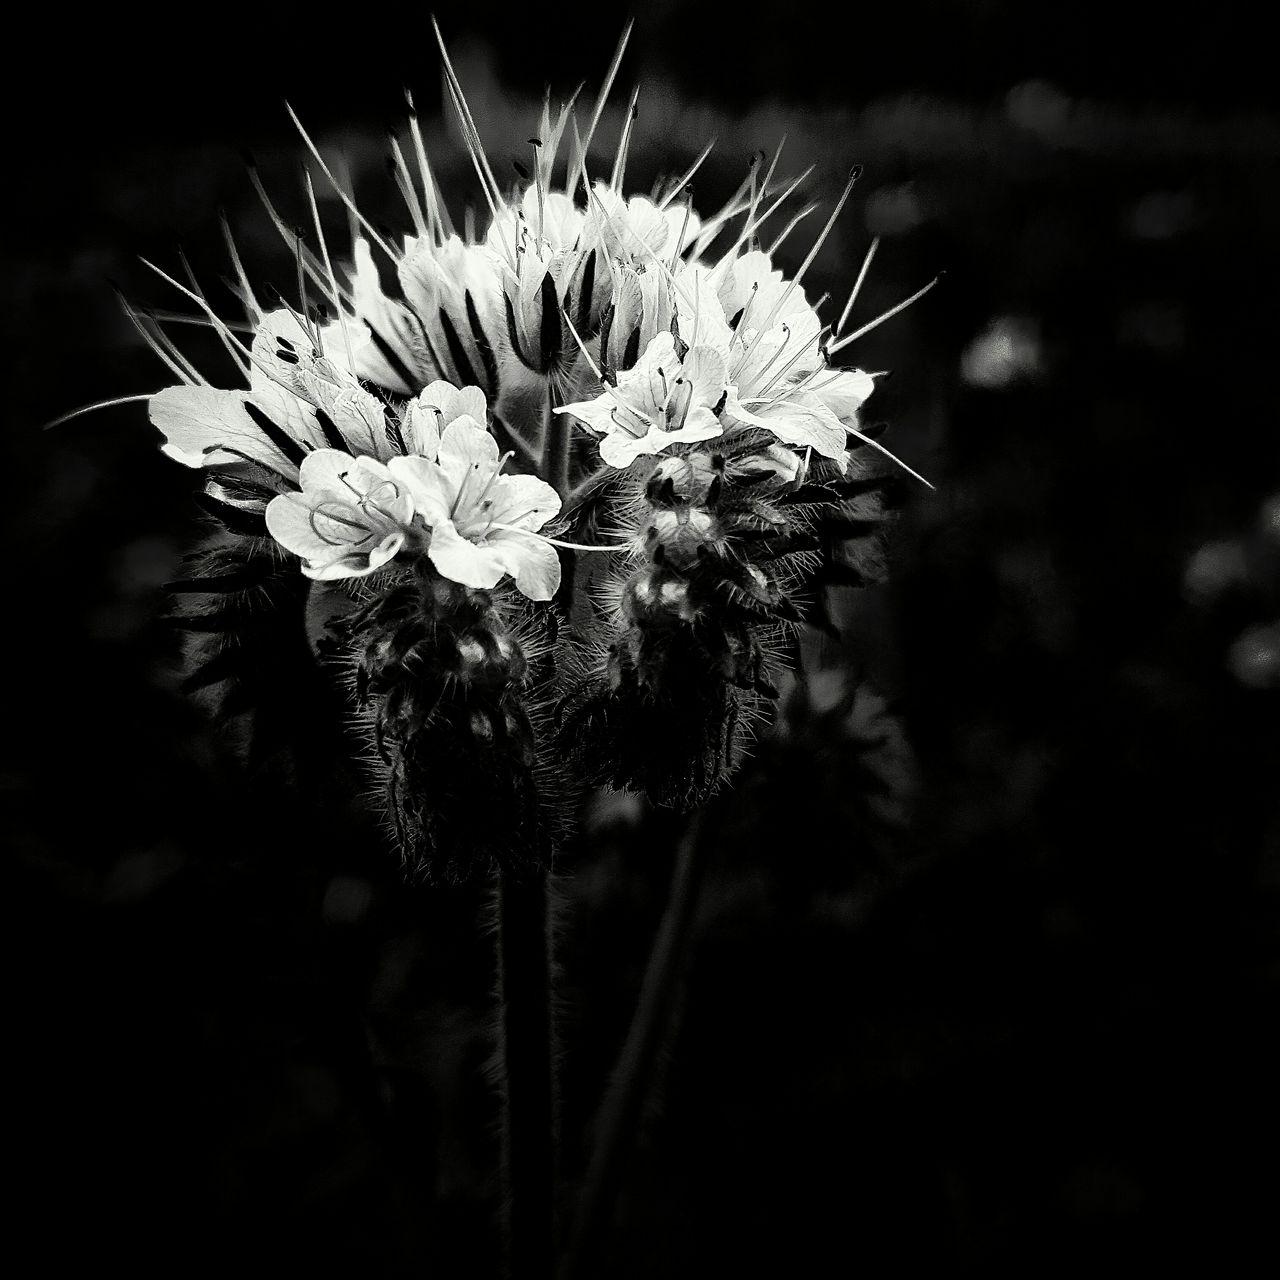 Black Background Outdoors No People Fragility Close-up Flower Flower Head Plant Nature Blackandwhite Black And White Photography Phacelia Tanacetifolia Black And White Friday